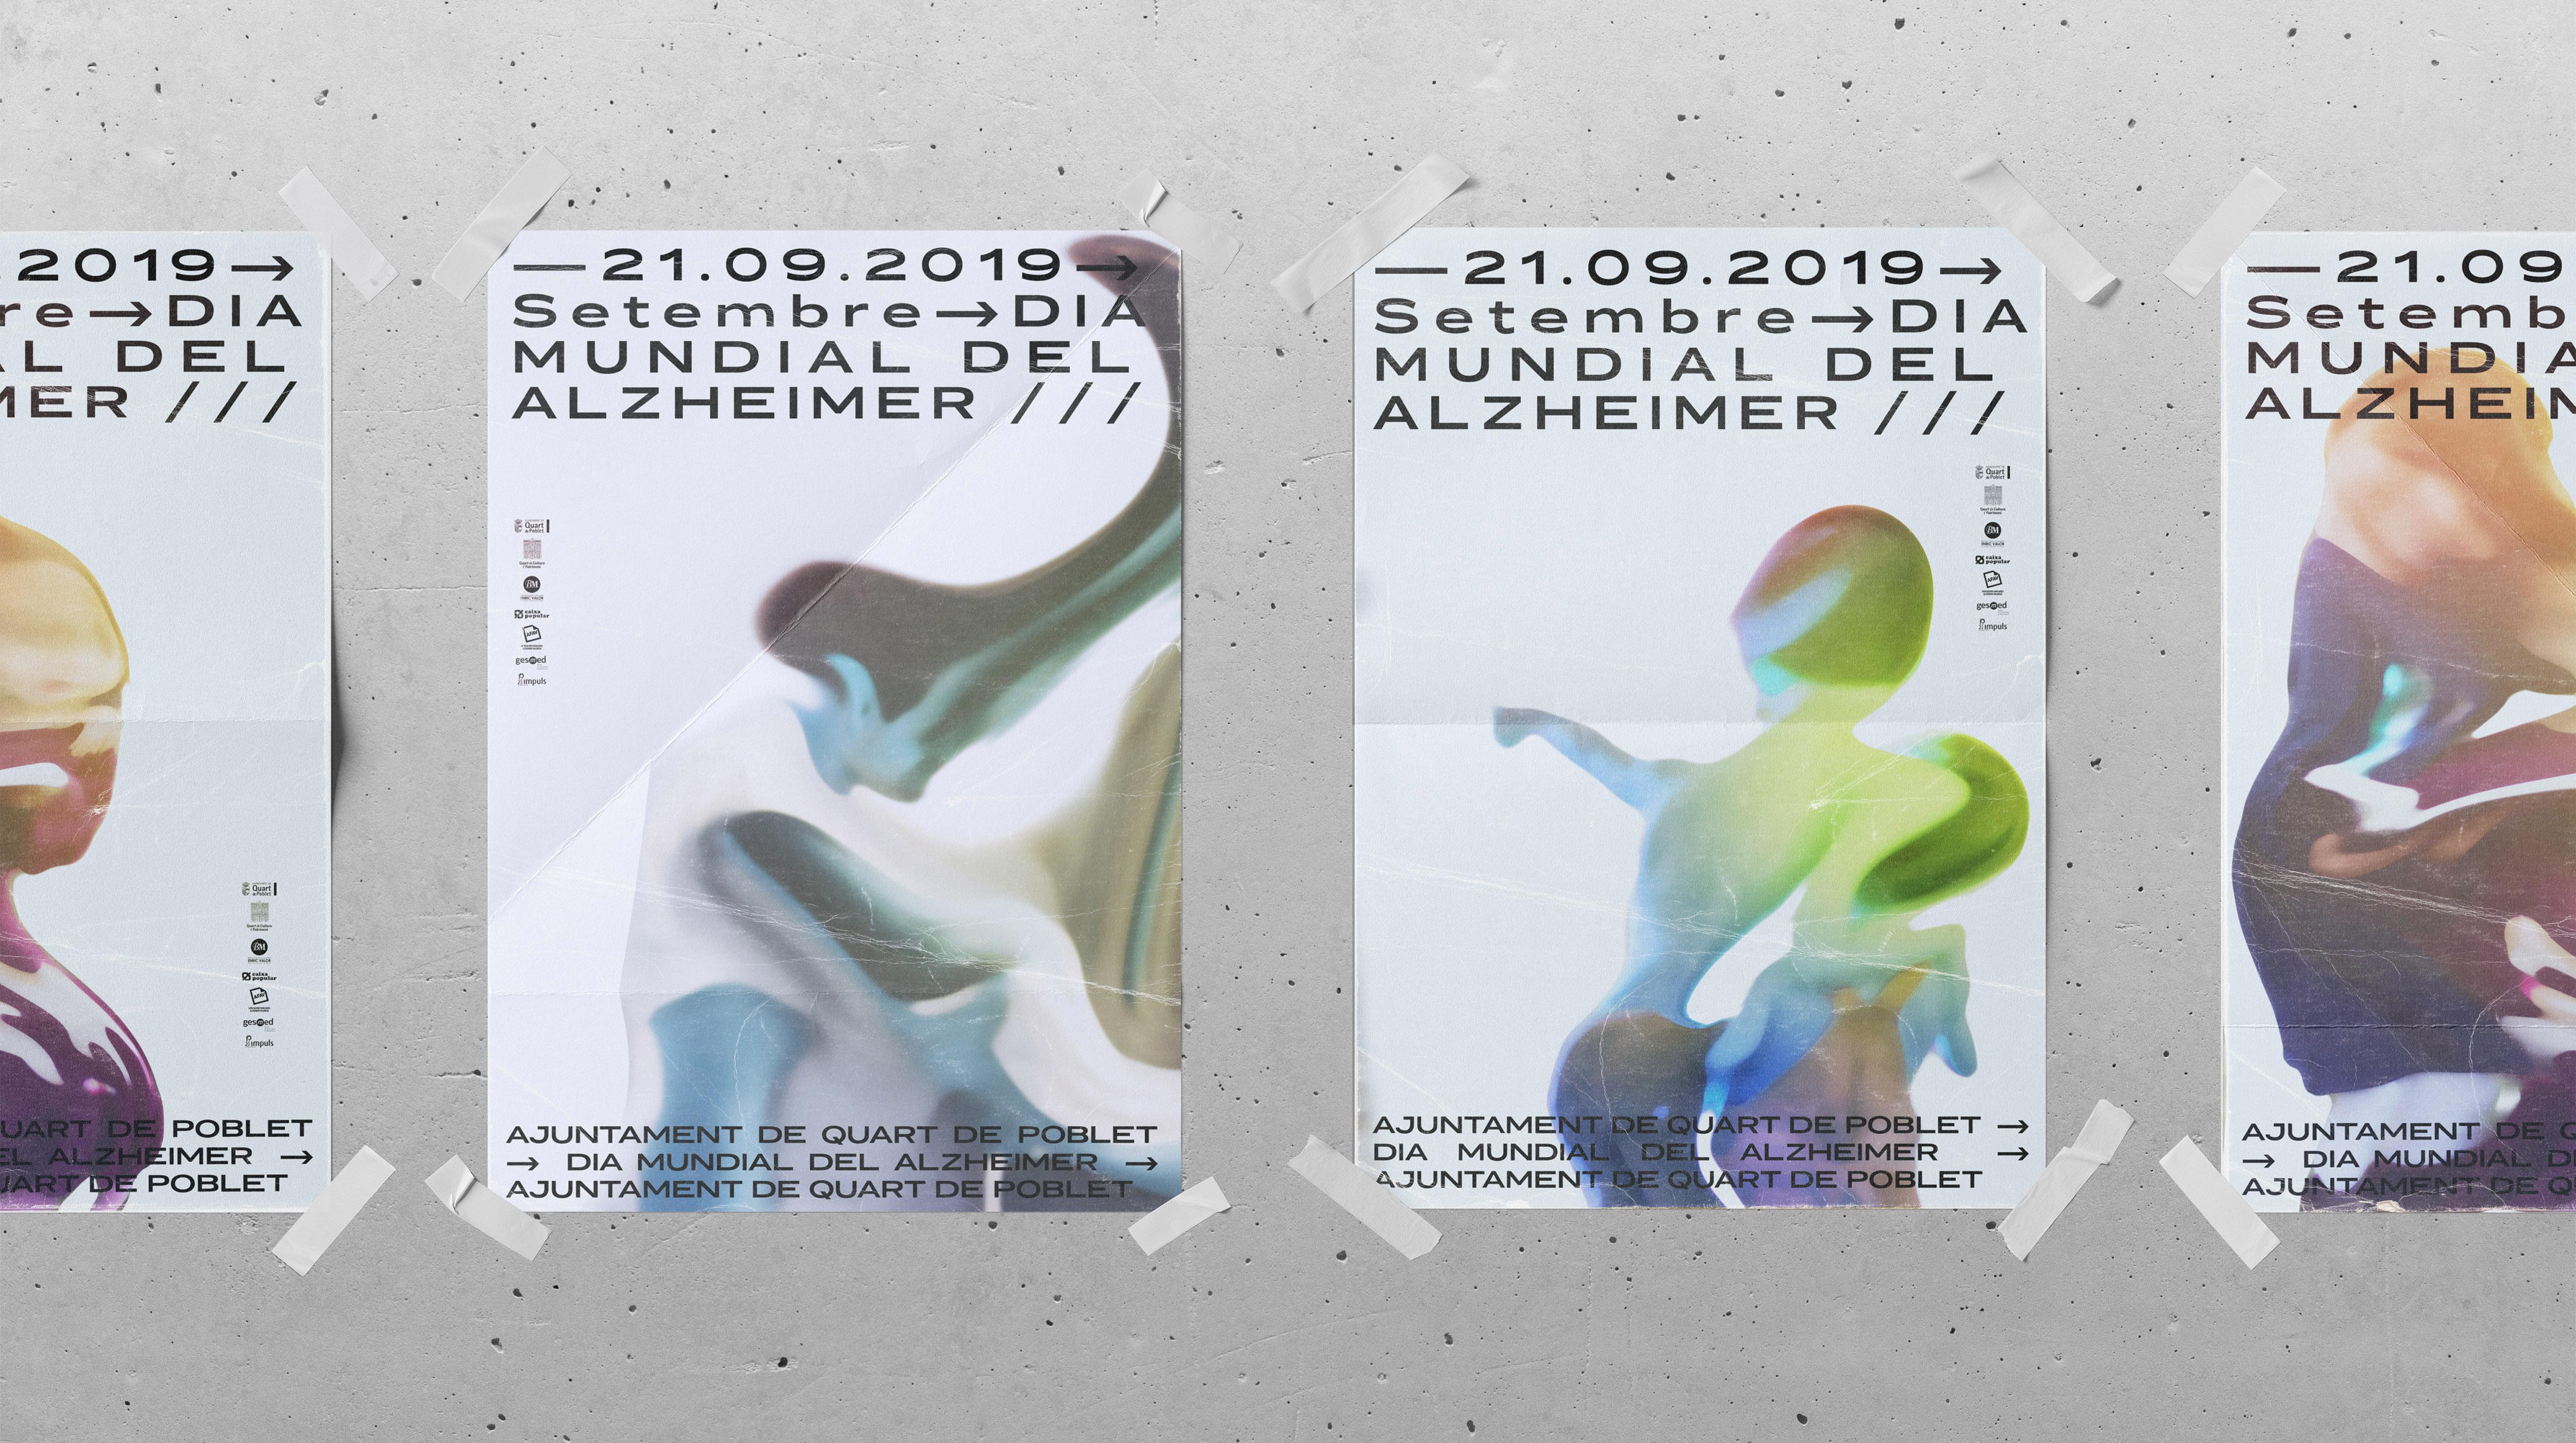 Día Mundial del Alzheimer by Locandia Estudio - Creative Work - $i